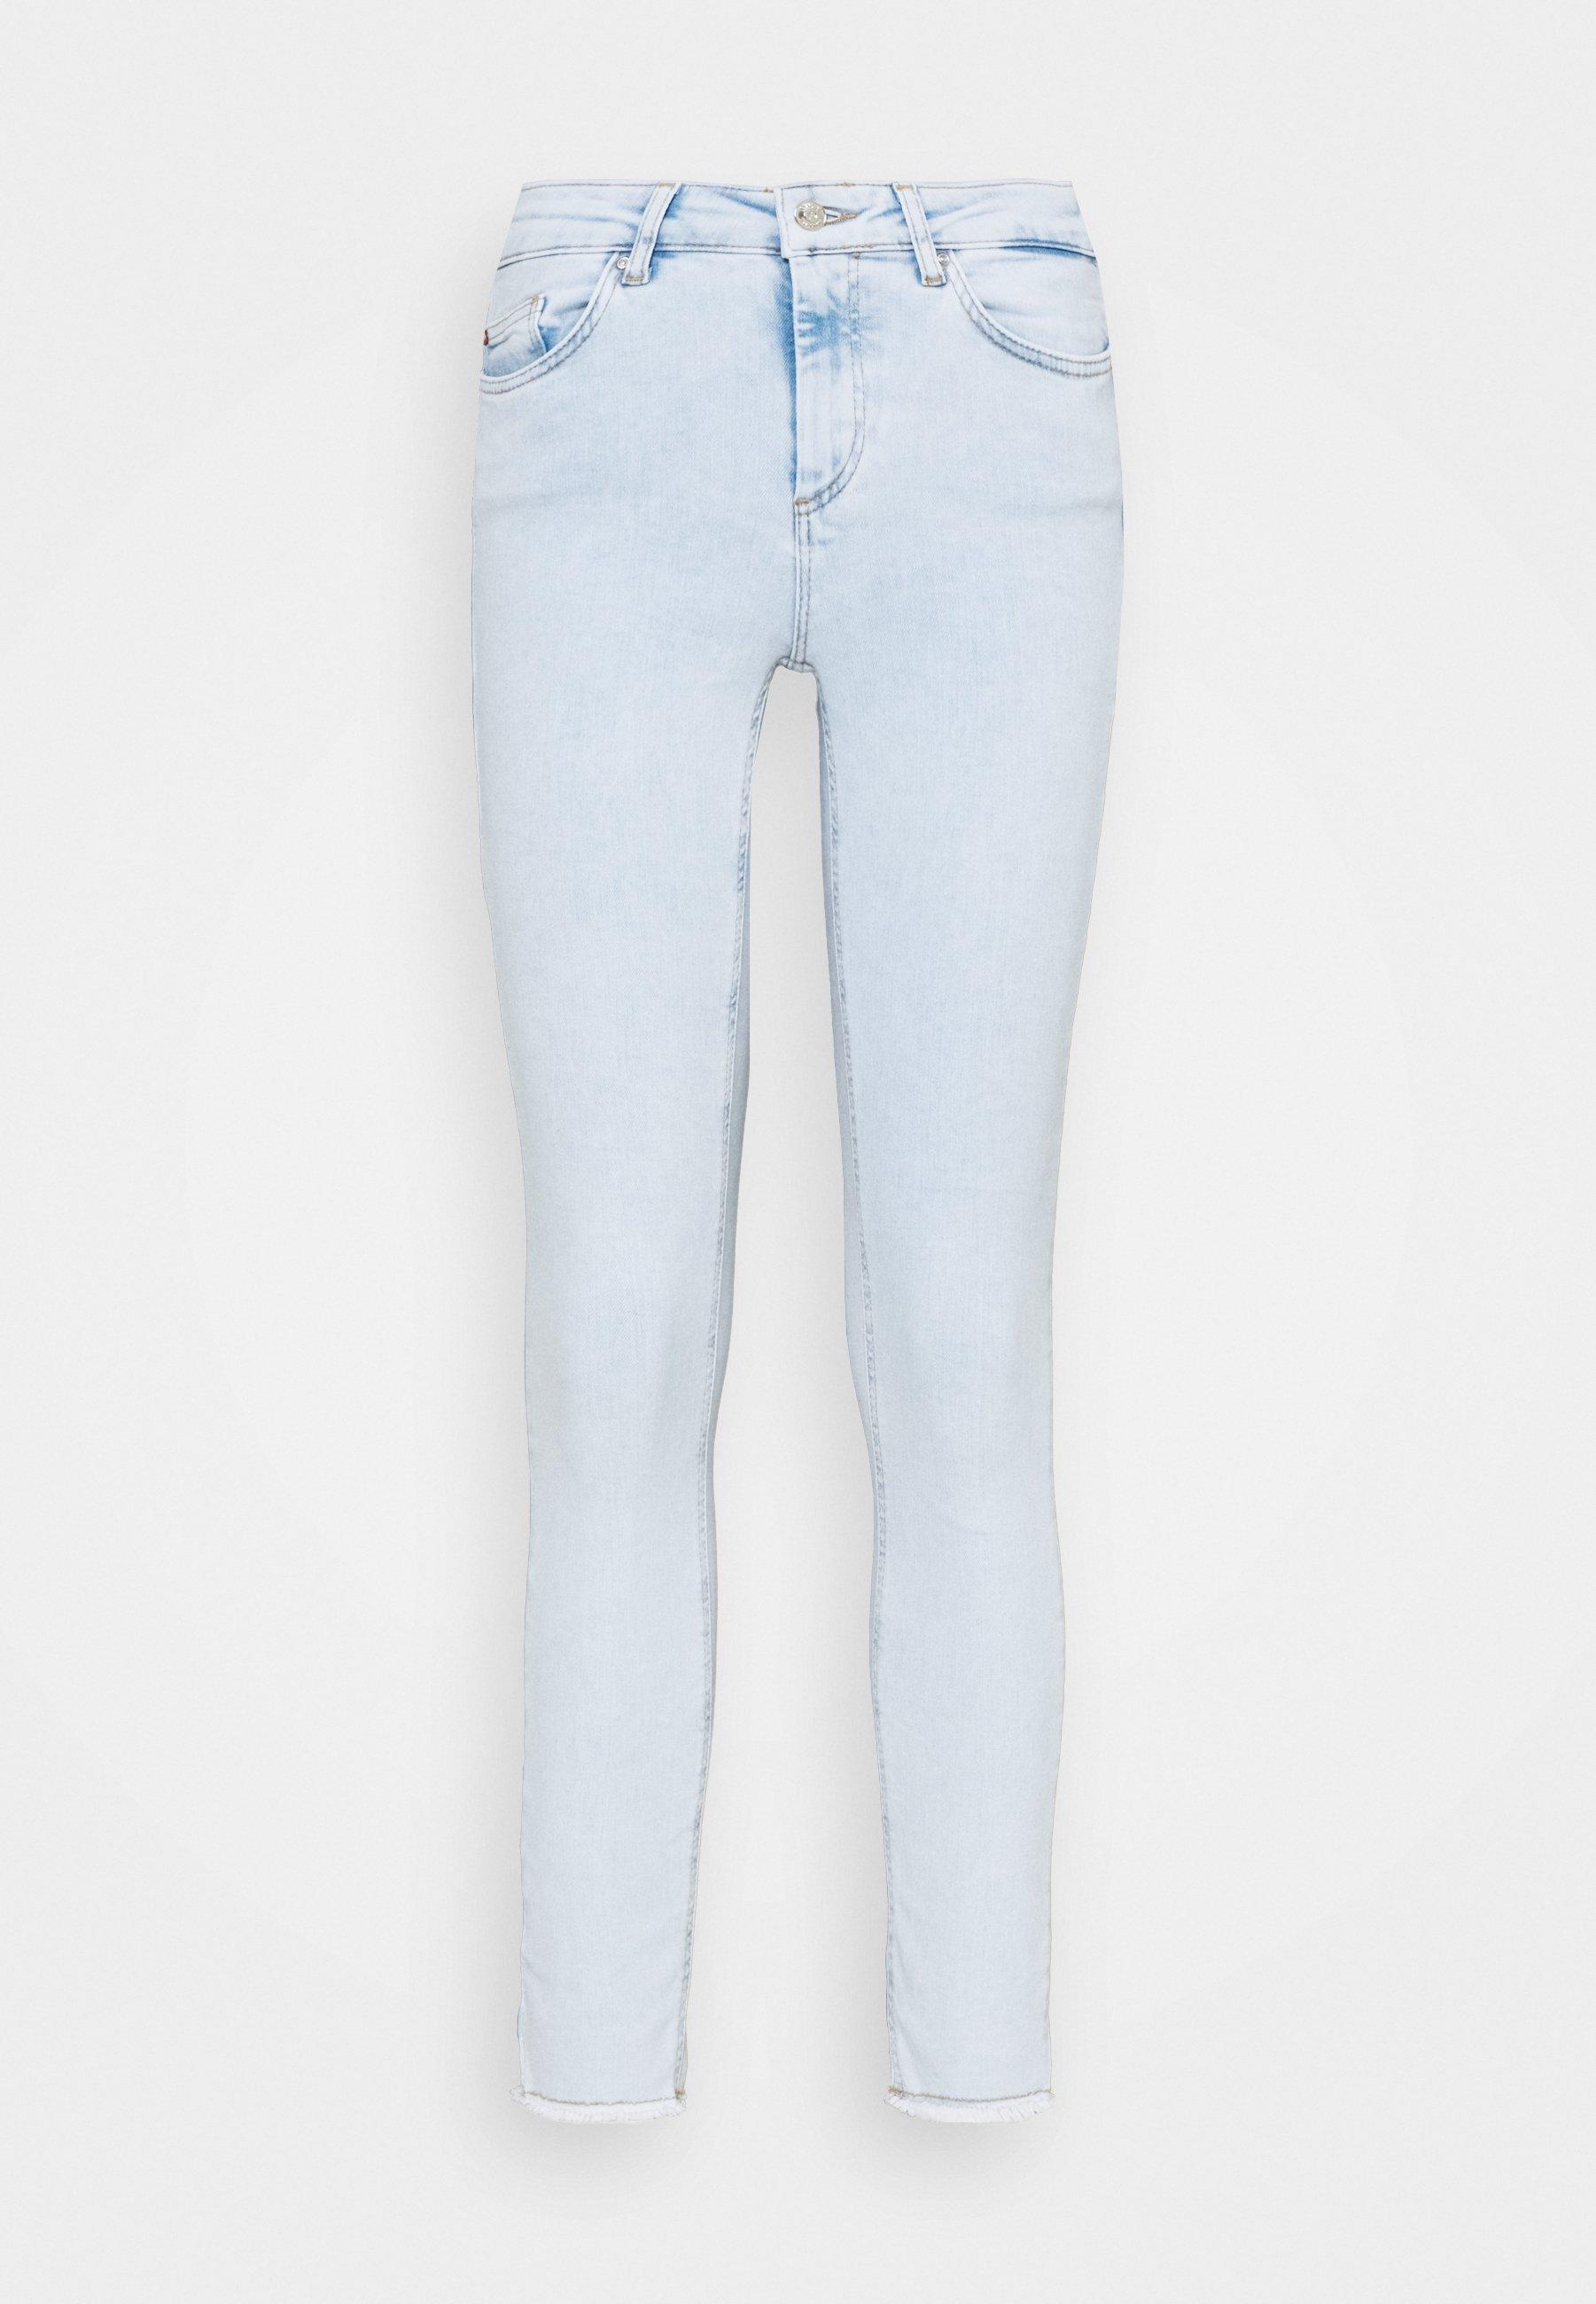 Donna ONLBLUSH LIFE MID RAW  - Jeans Skinny Fit - light blue